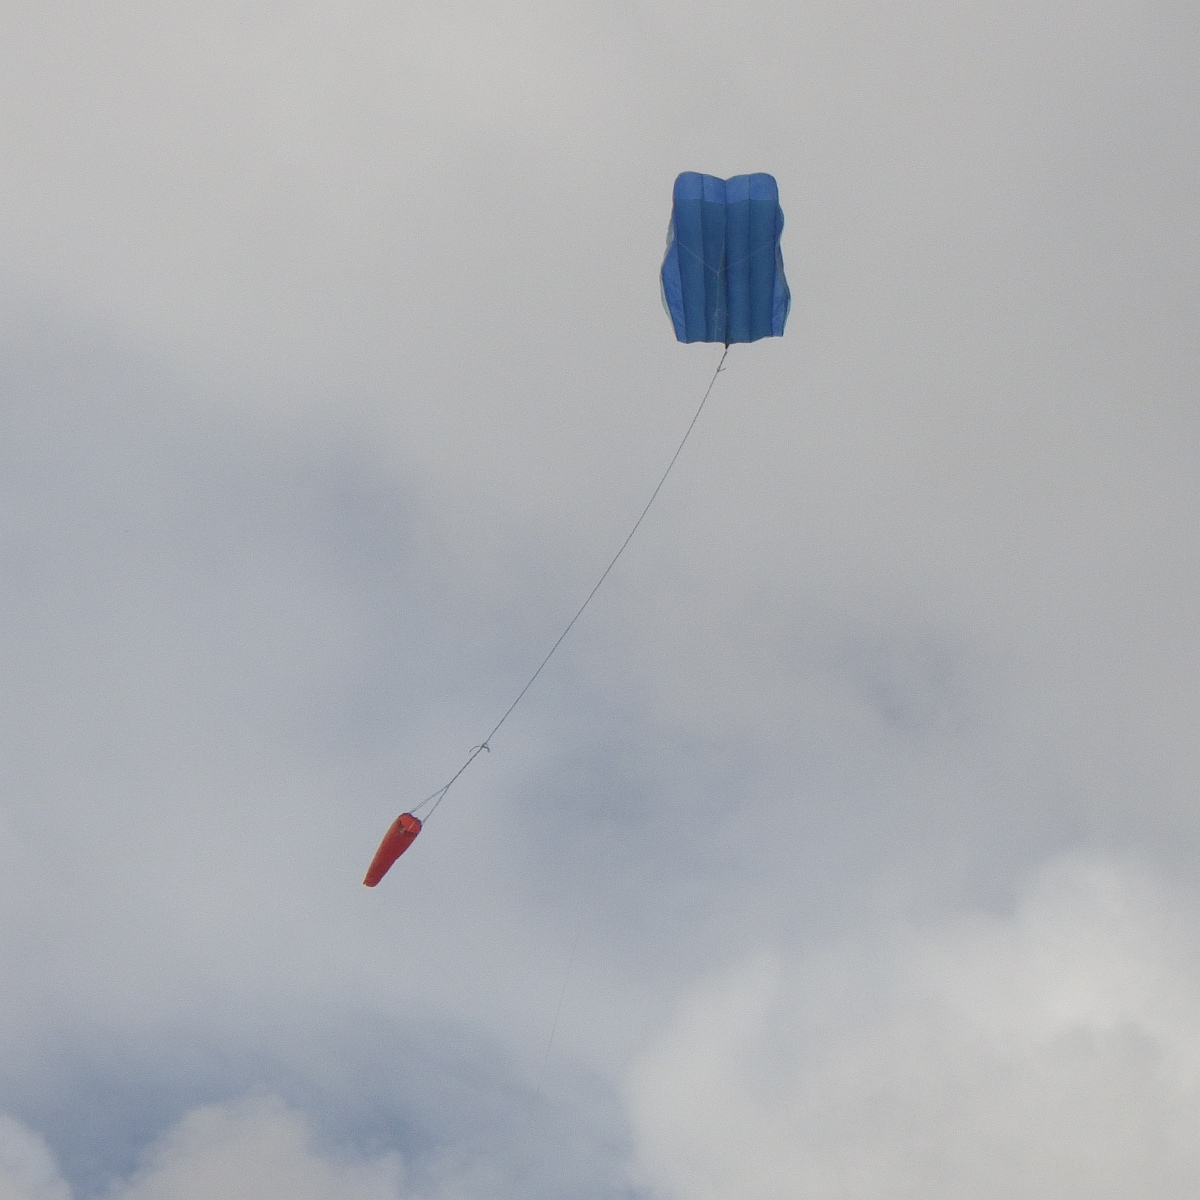 MBK Parafoil kite 1 - 2.